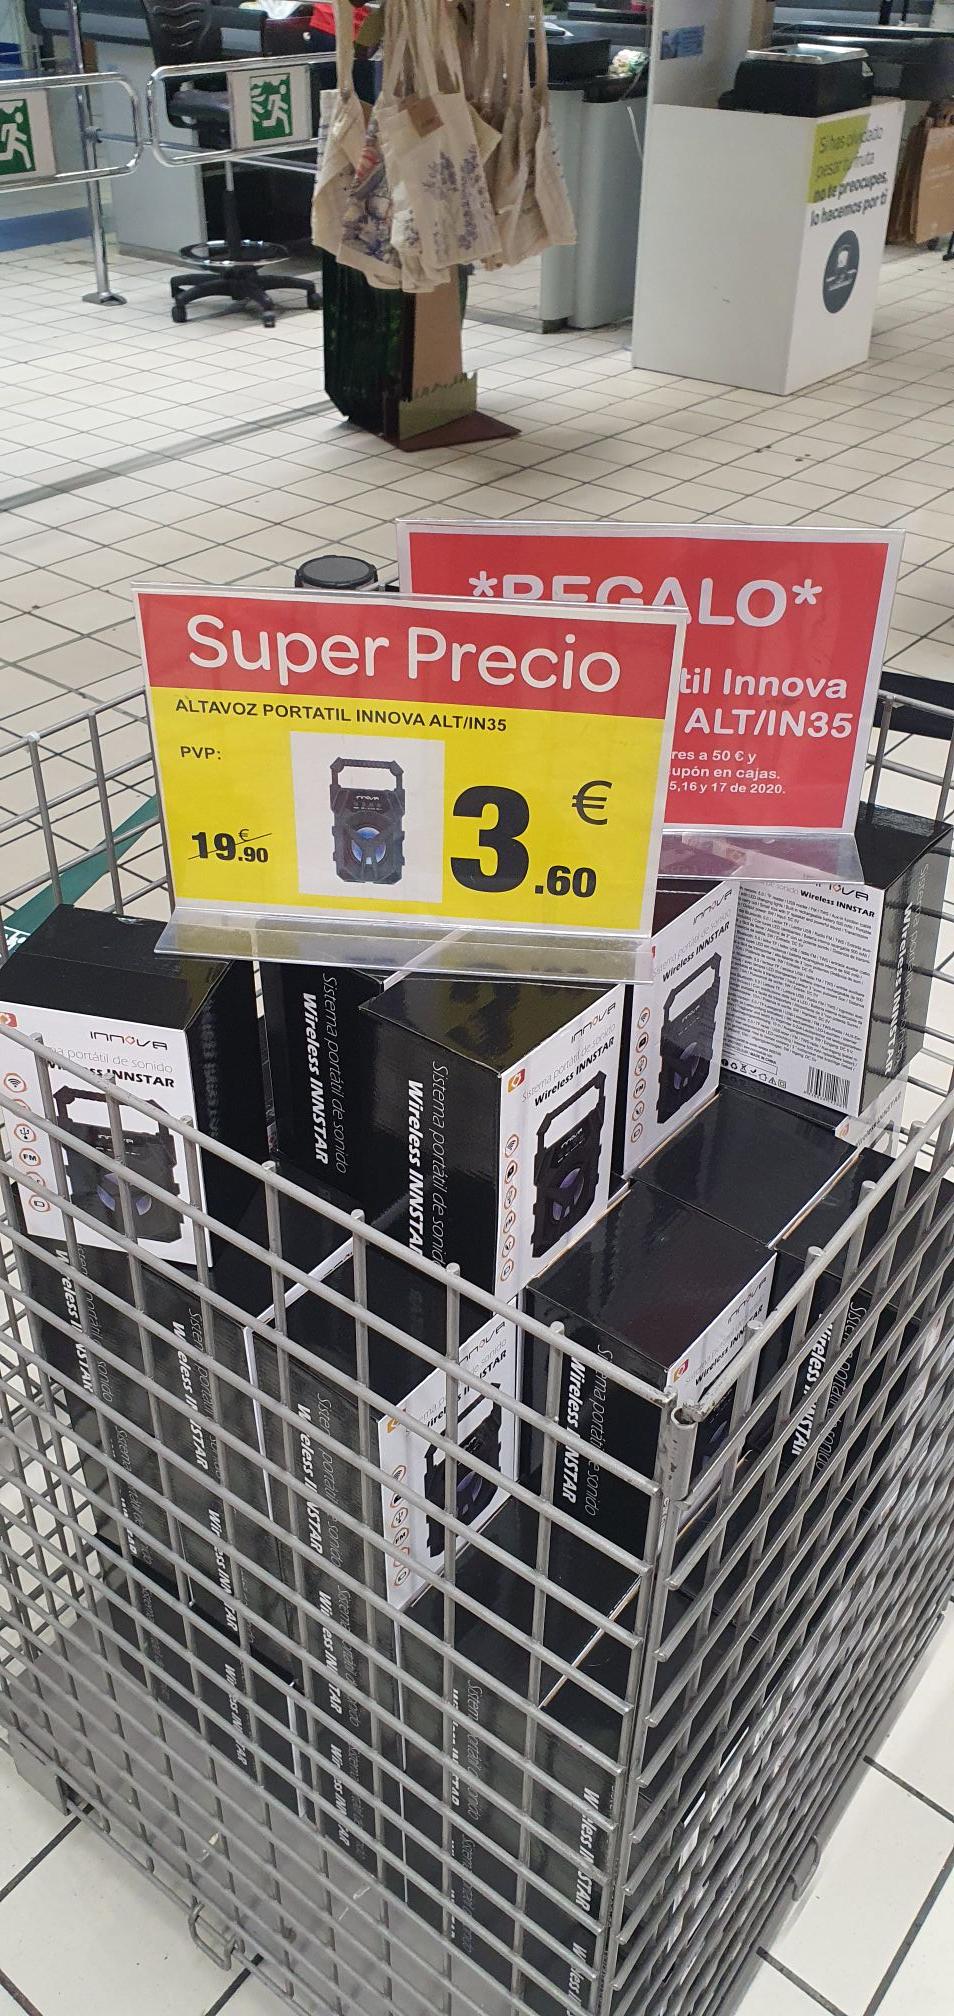 Altavoz portatil innova alt/ IN35